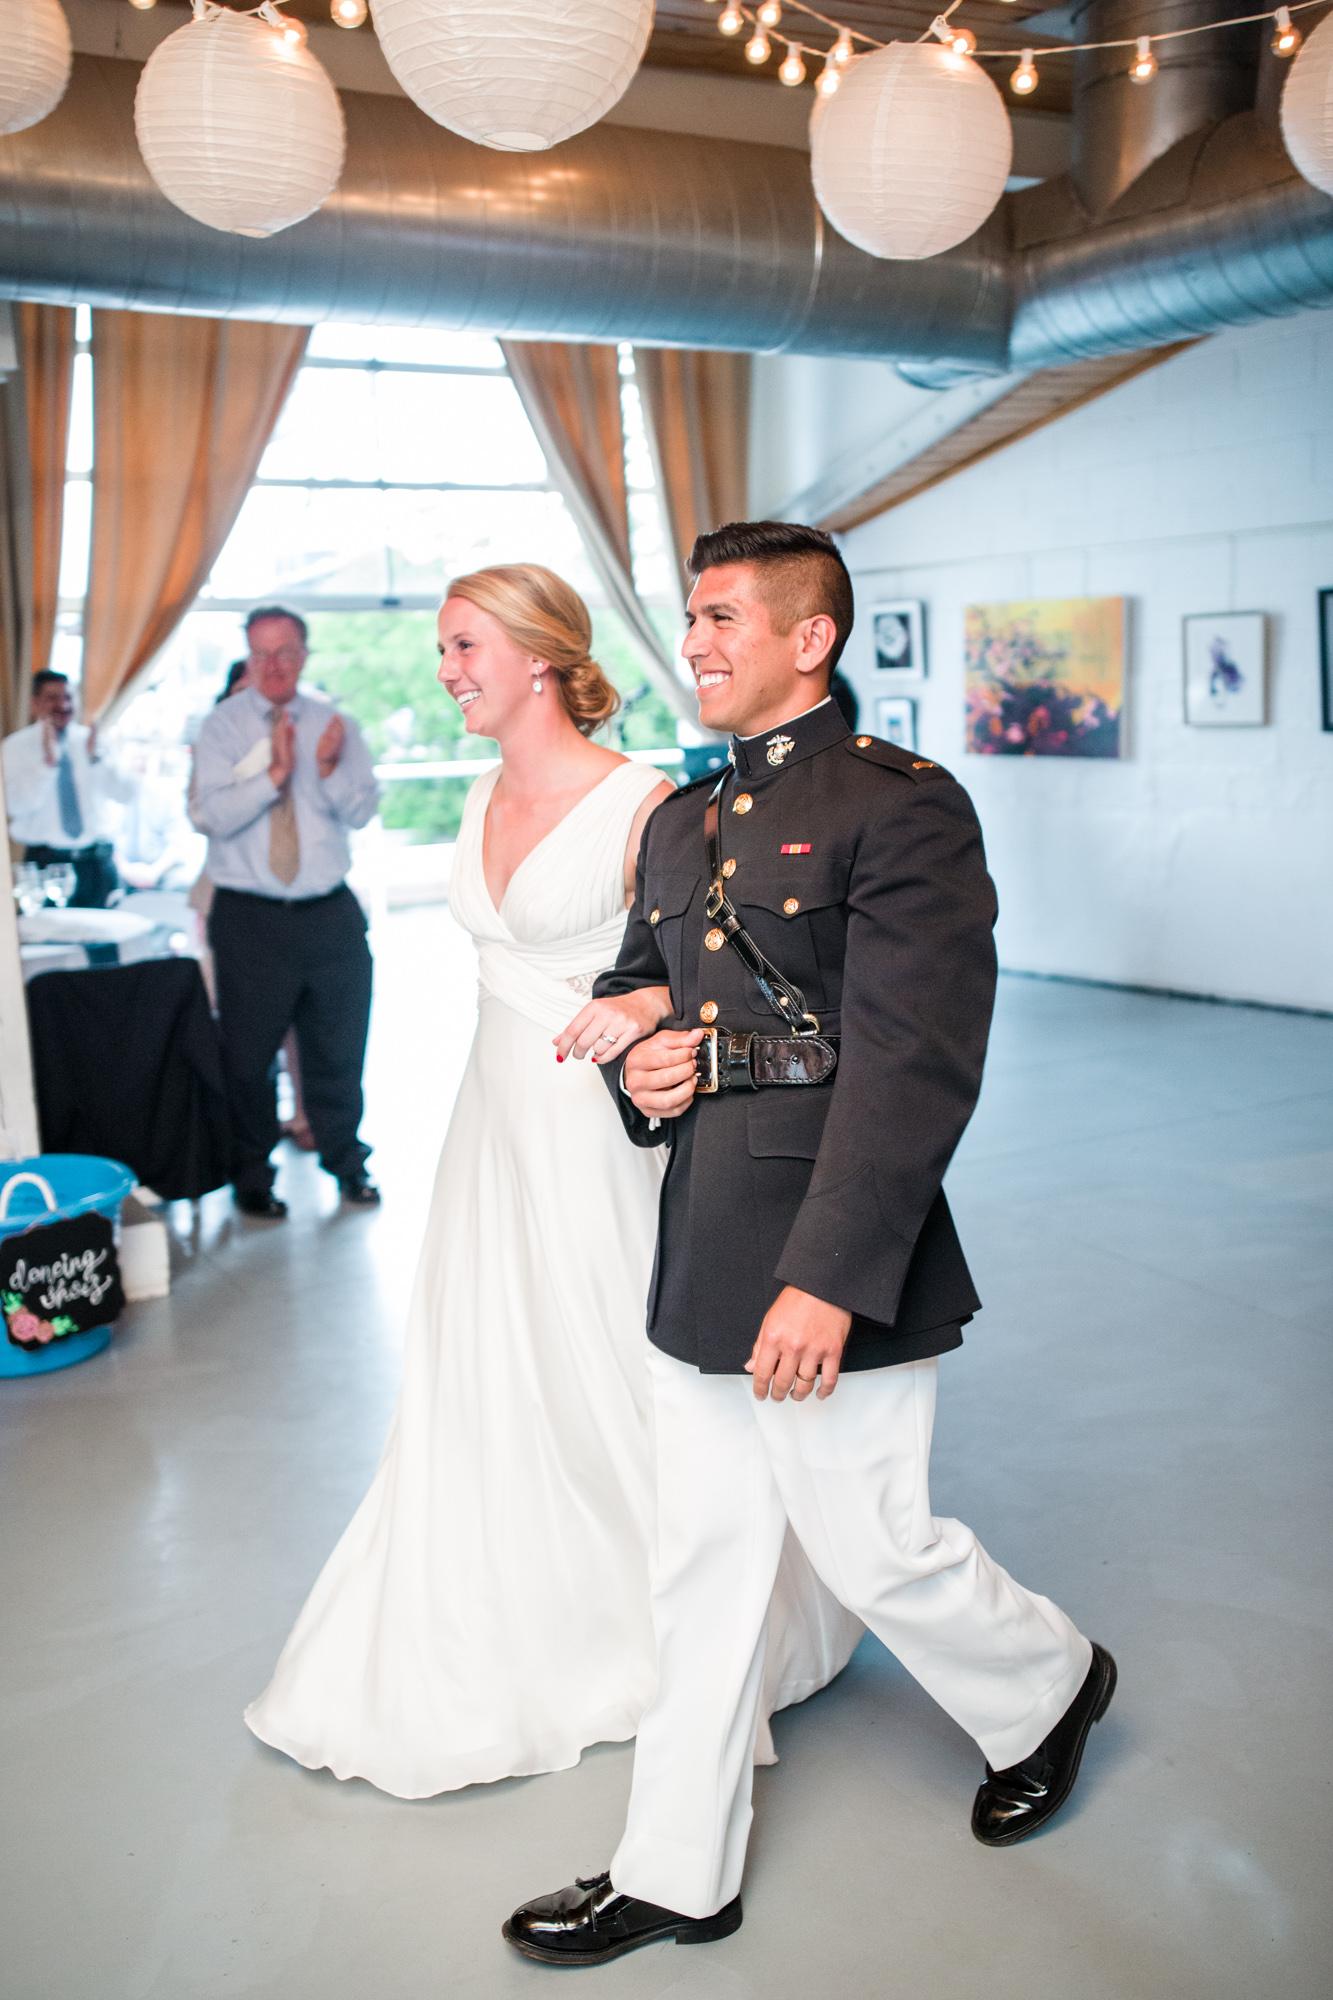 2017_05_27_ray_caroline_naval_wedding-3595.jpg